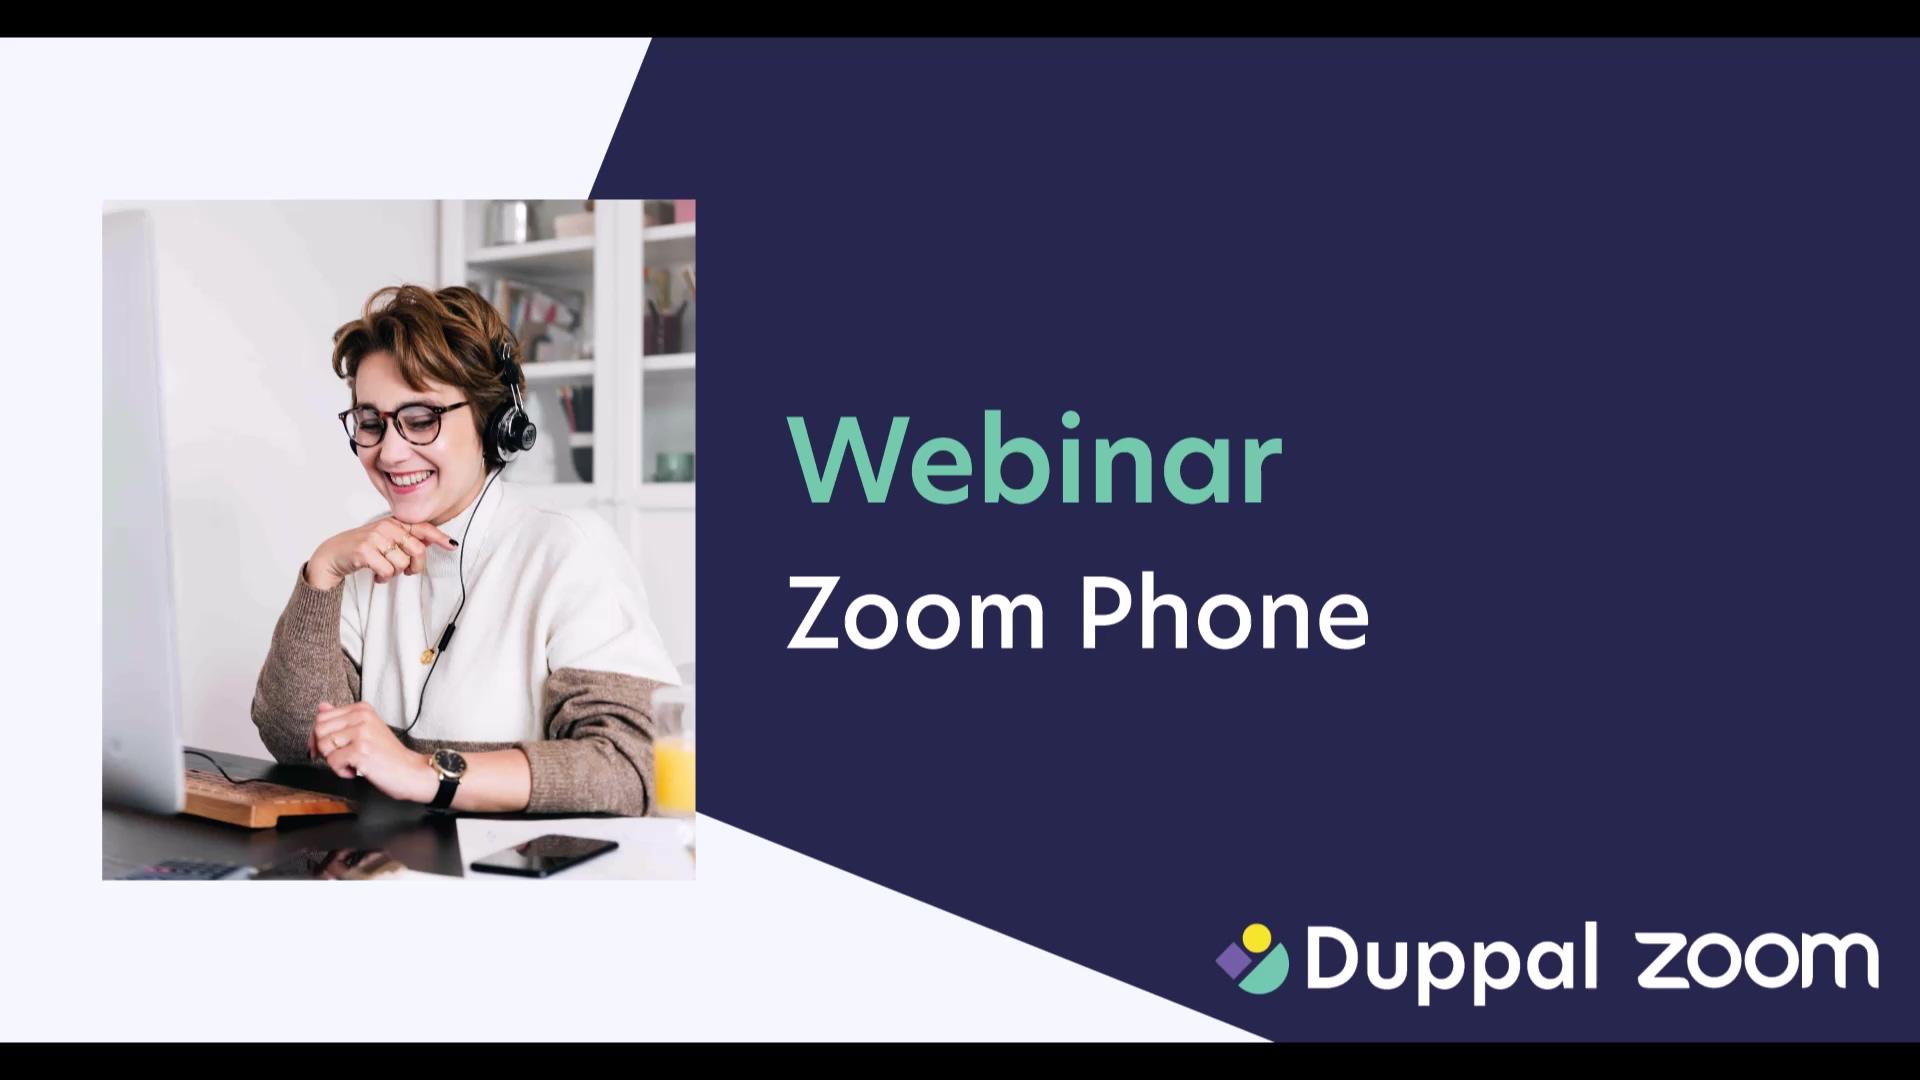 Duppal Webinar - Zoom Phone NL